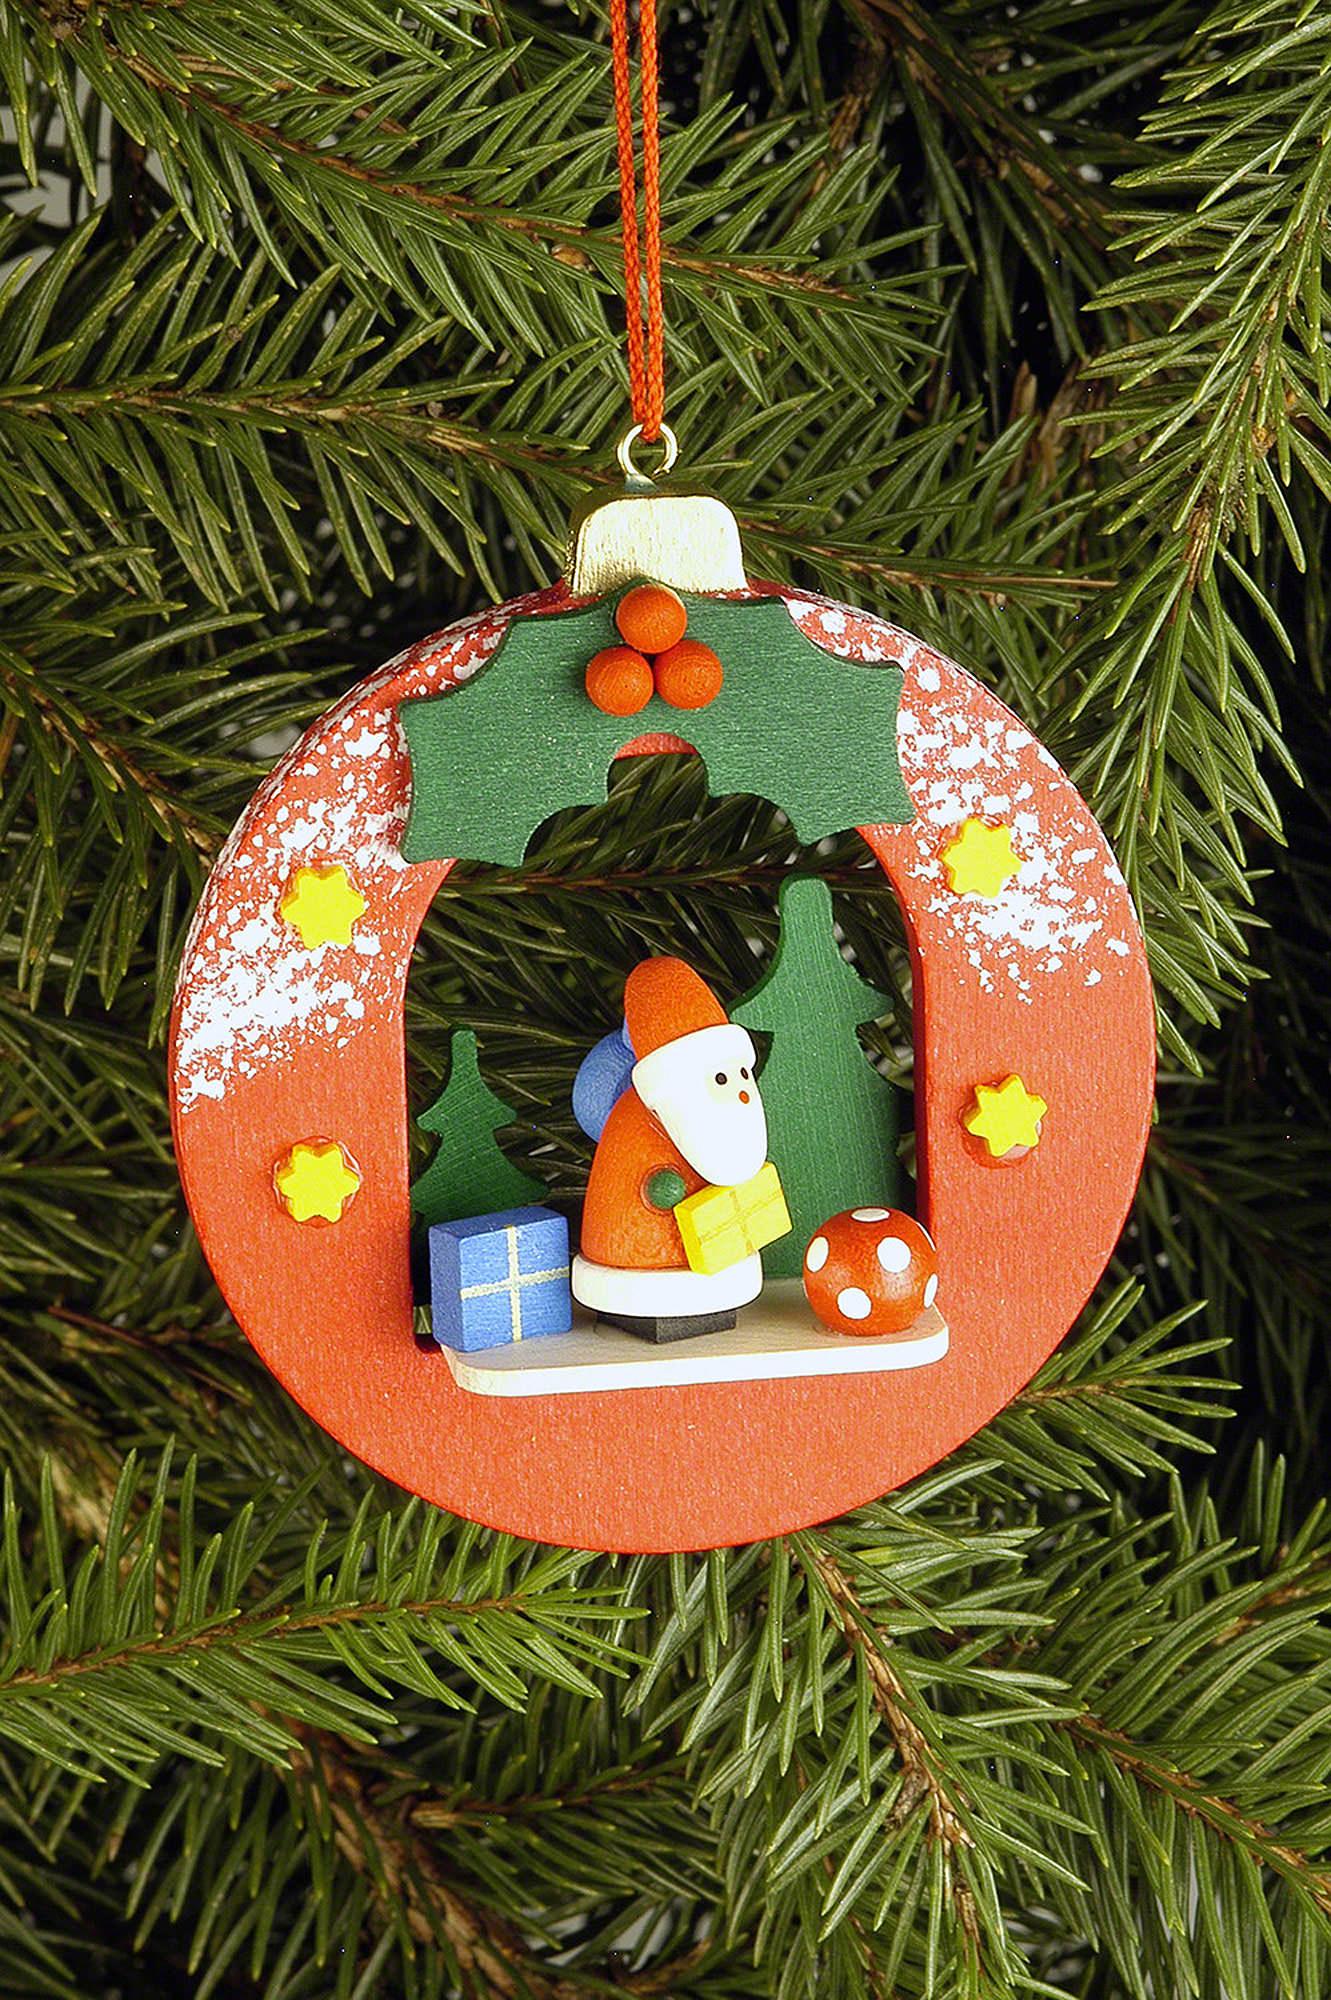 Christian Ulbricht Santa Claus